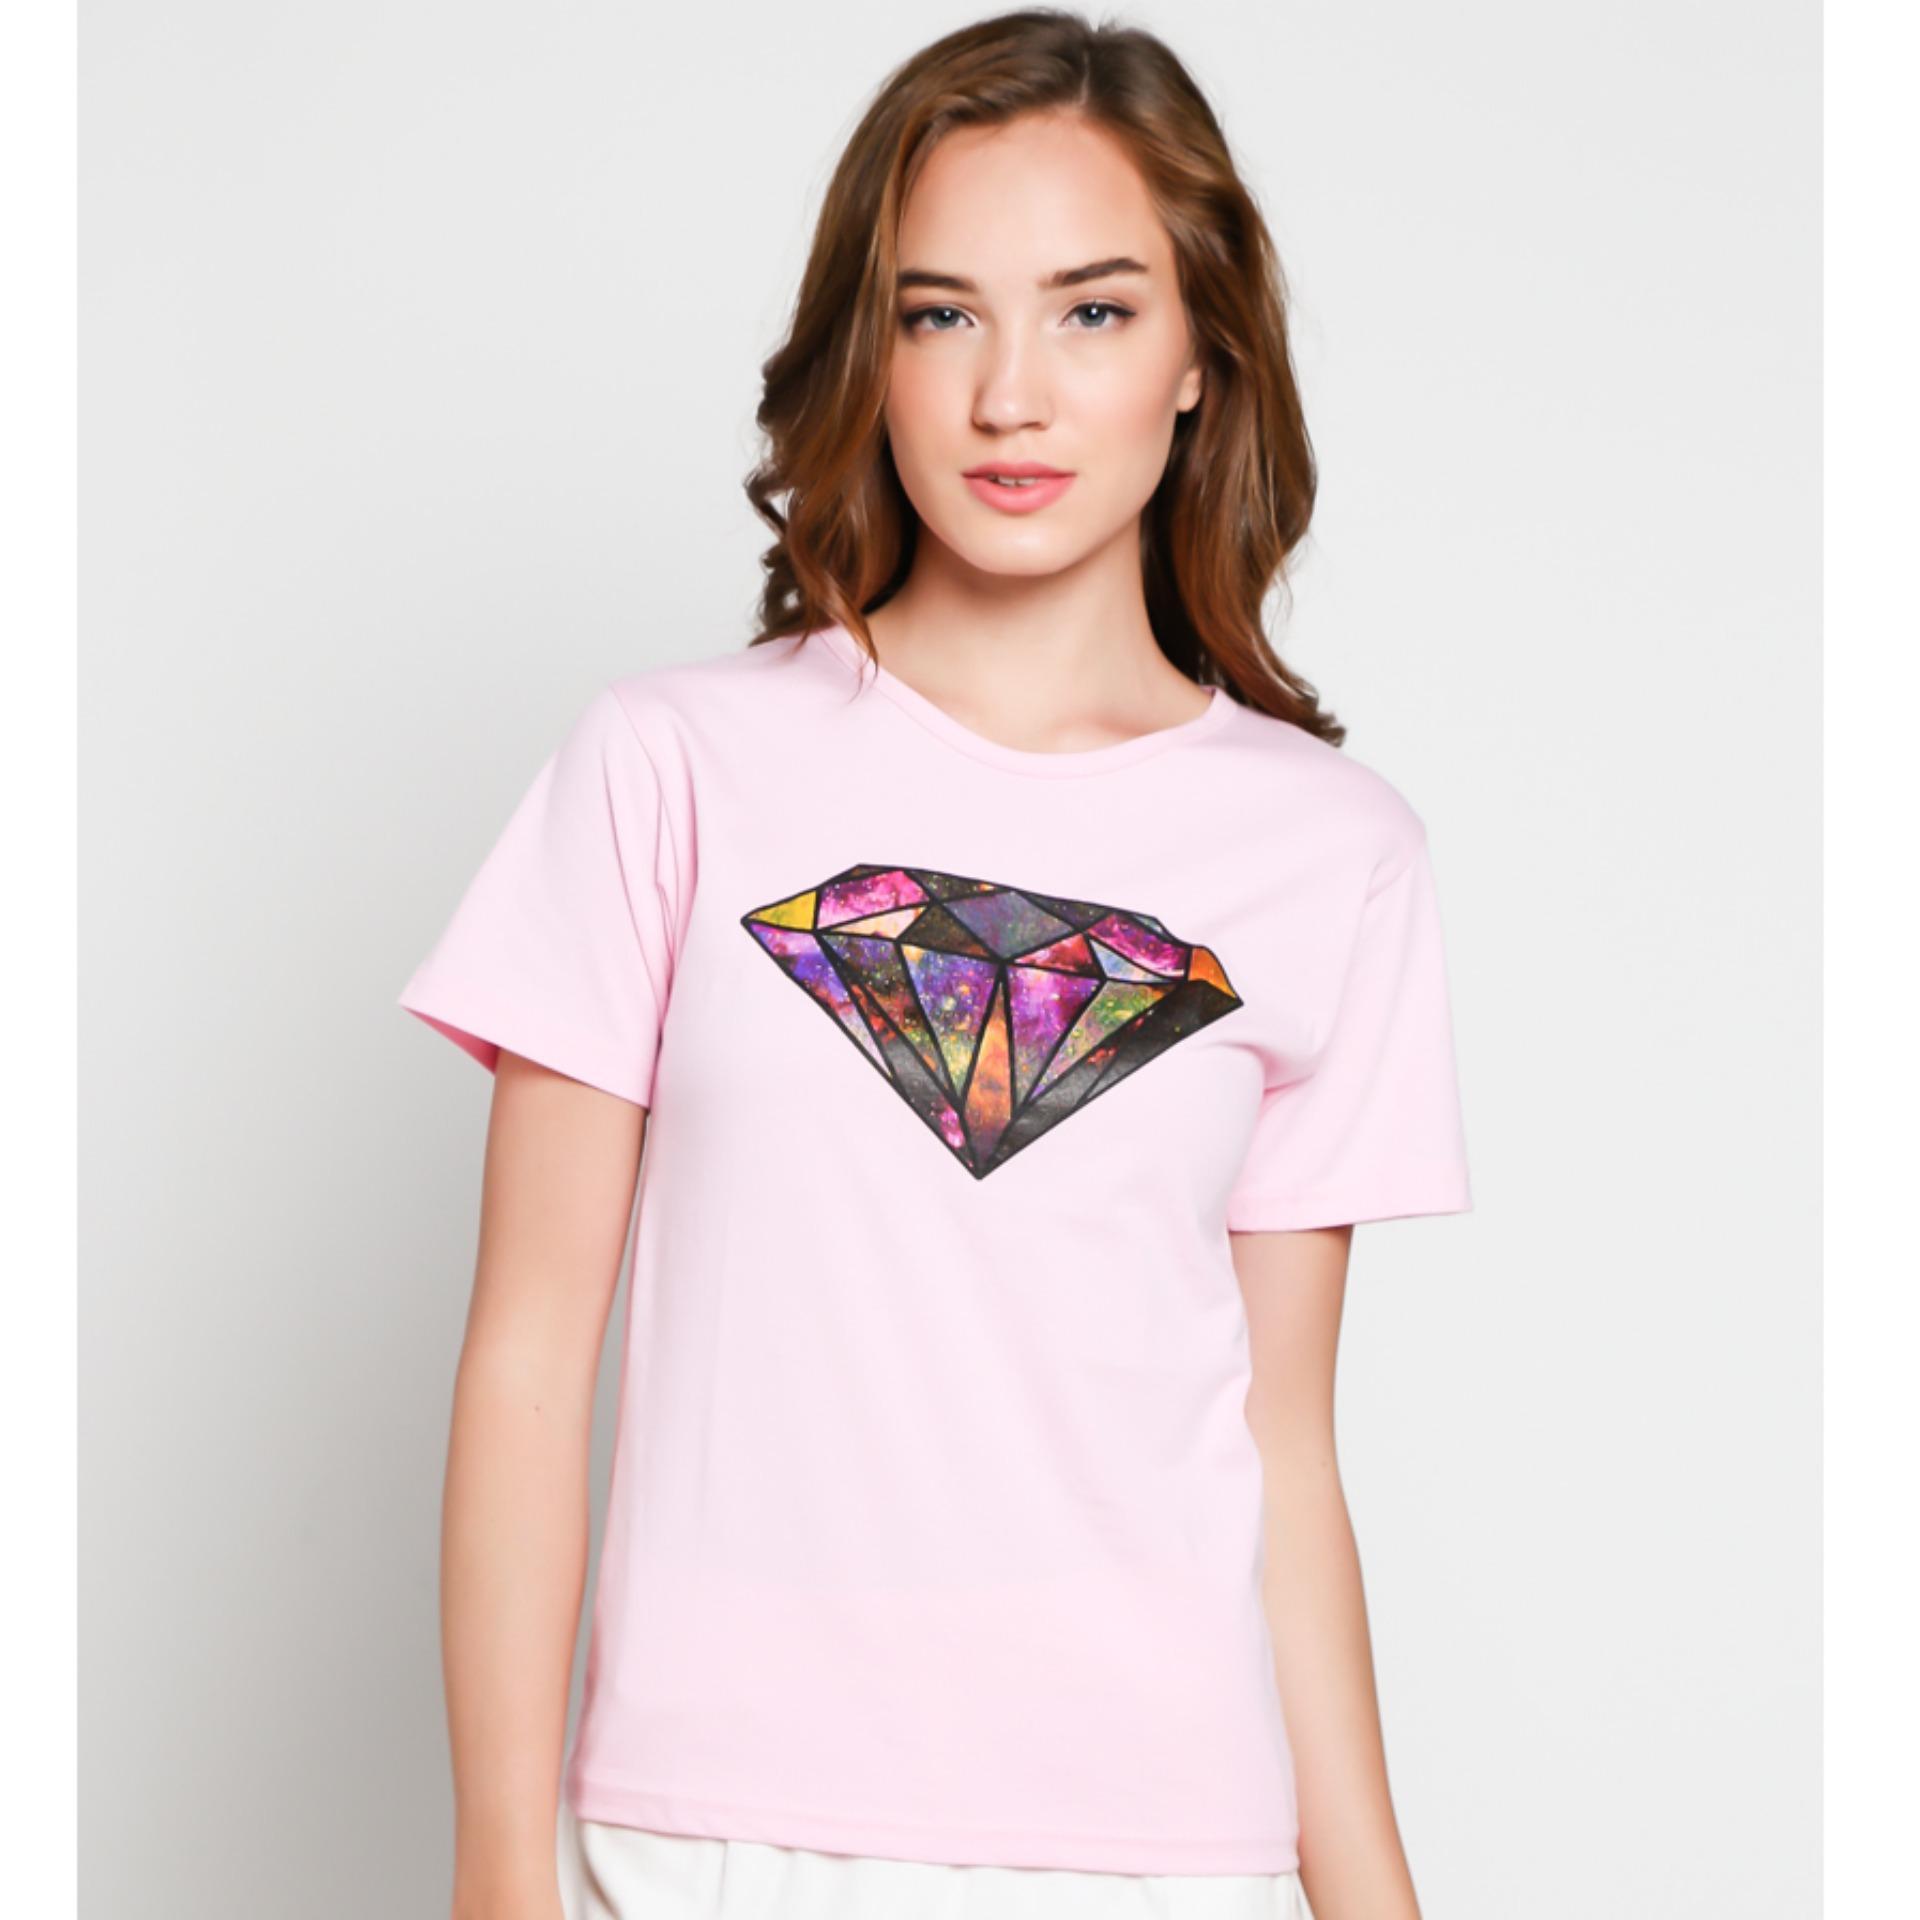 JCLOTHES - Tumblr Tee Tshirt Diamond Kaos Wanita